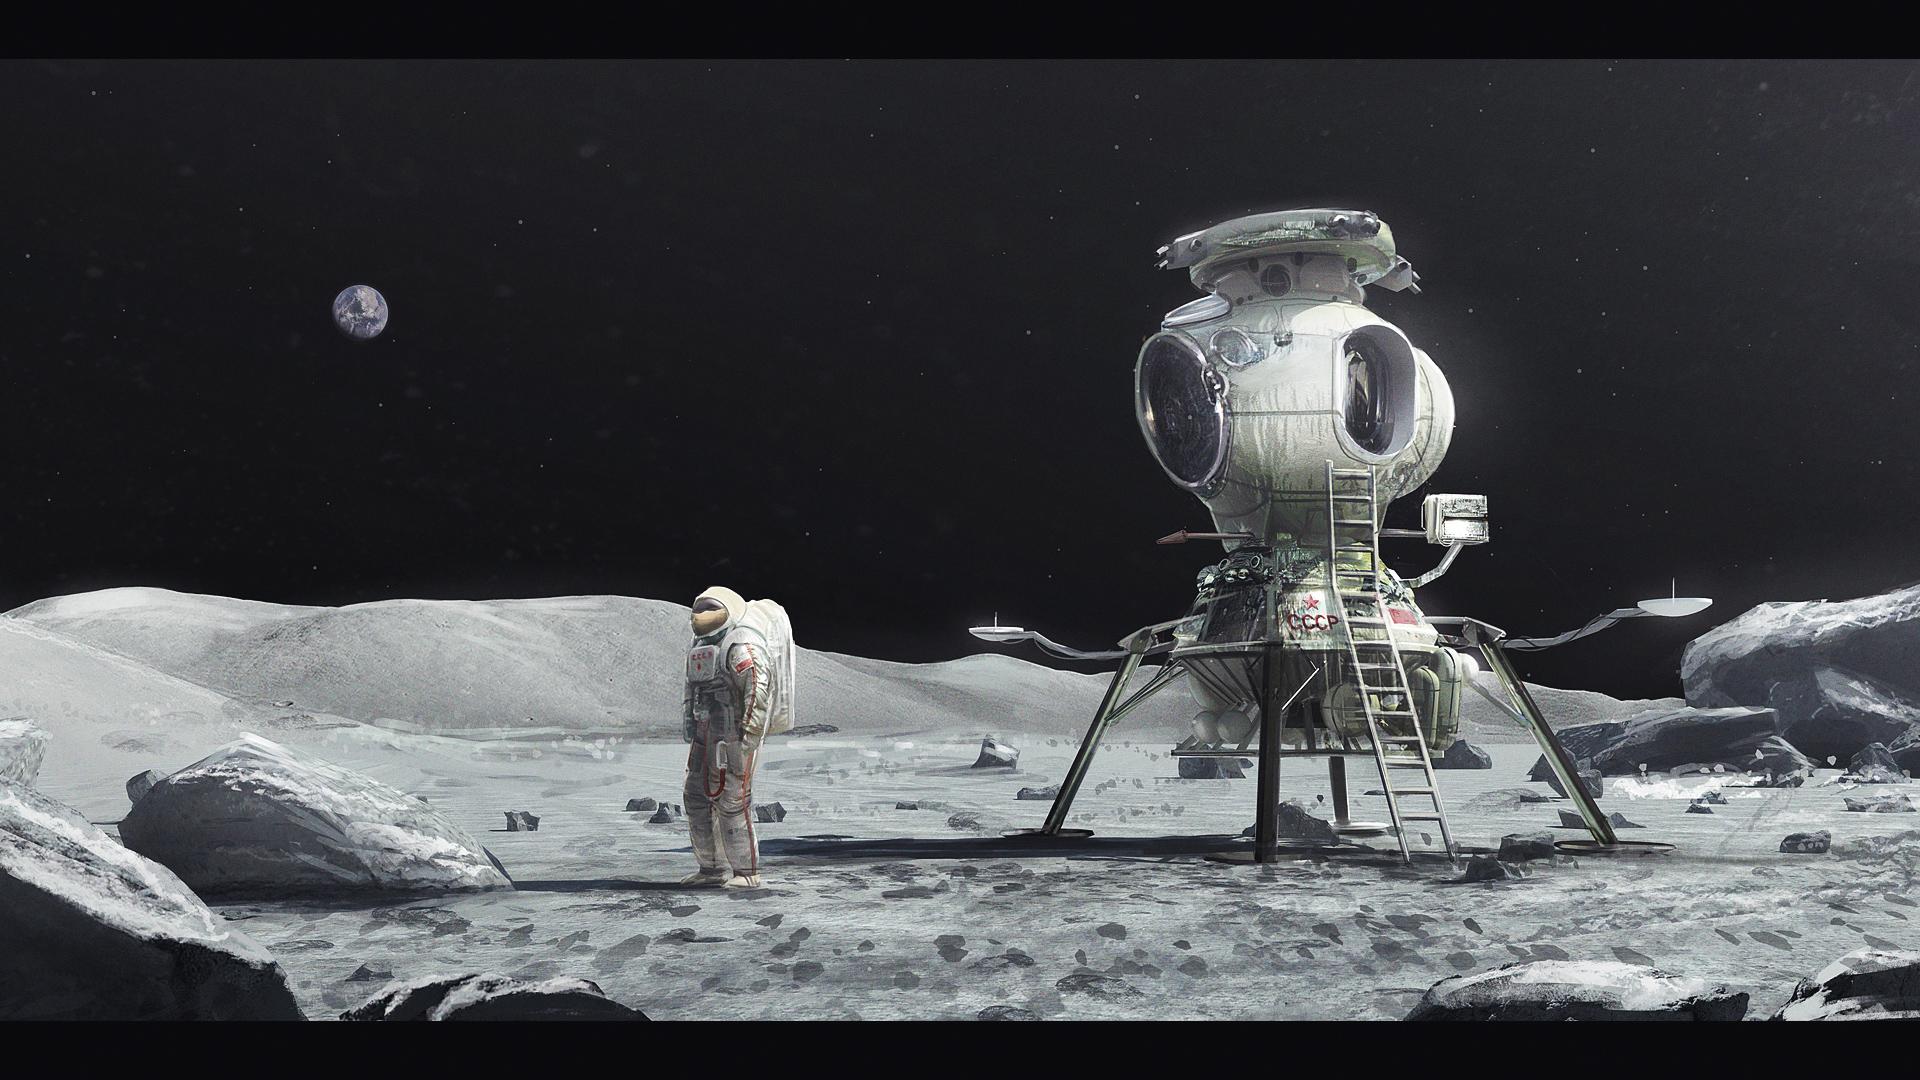 soviets moon landing rockets - photo #19